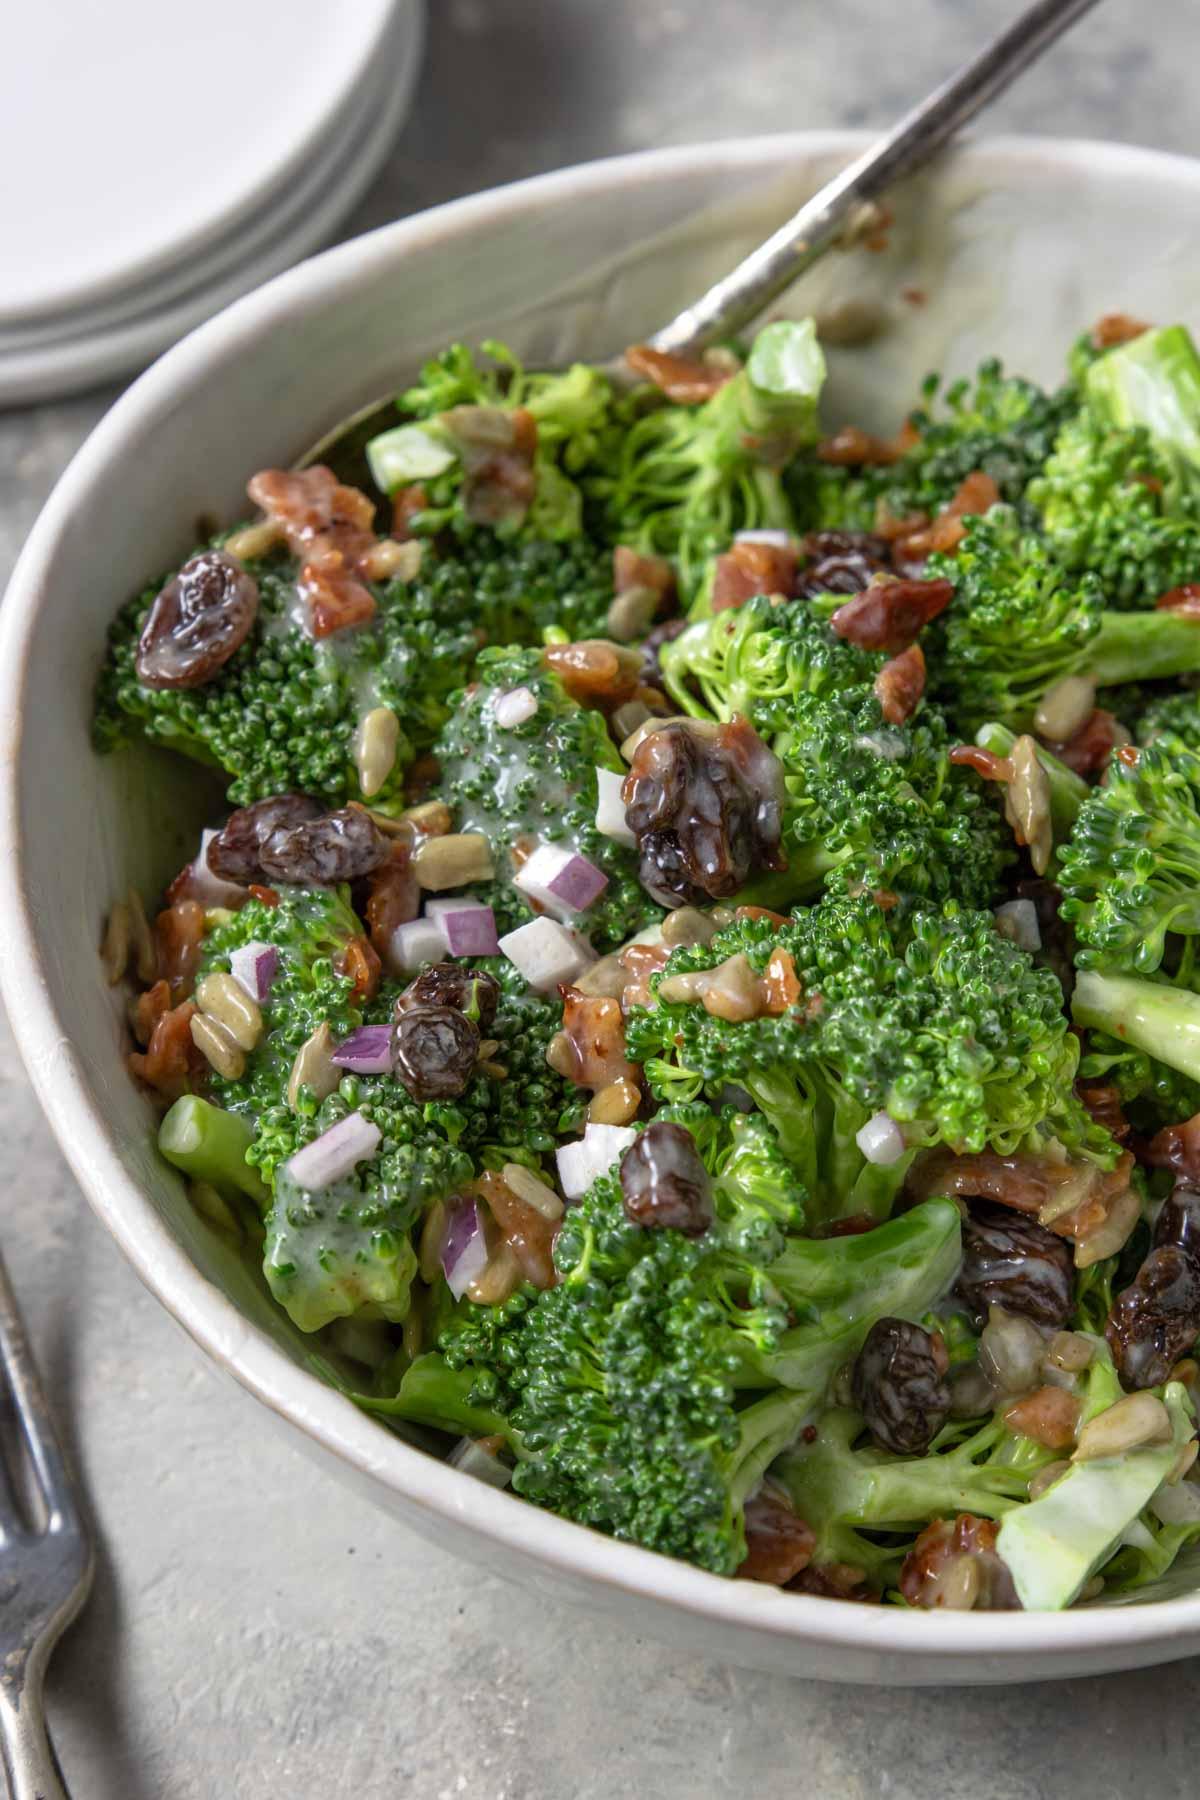 Broccoli Bacon Salad in a bowl